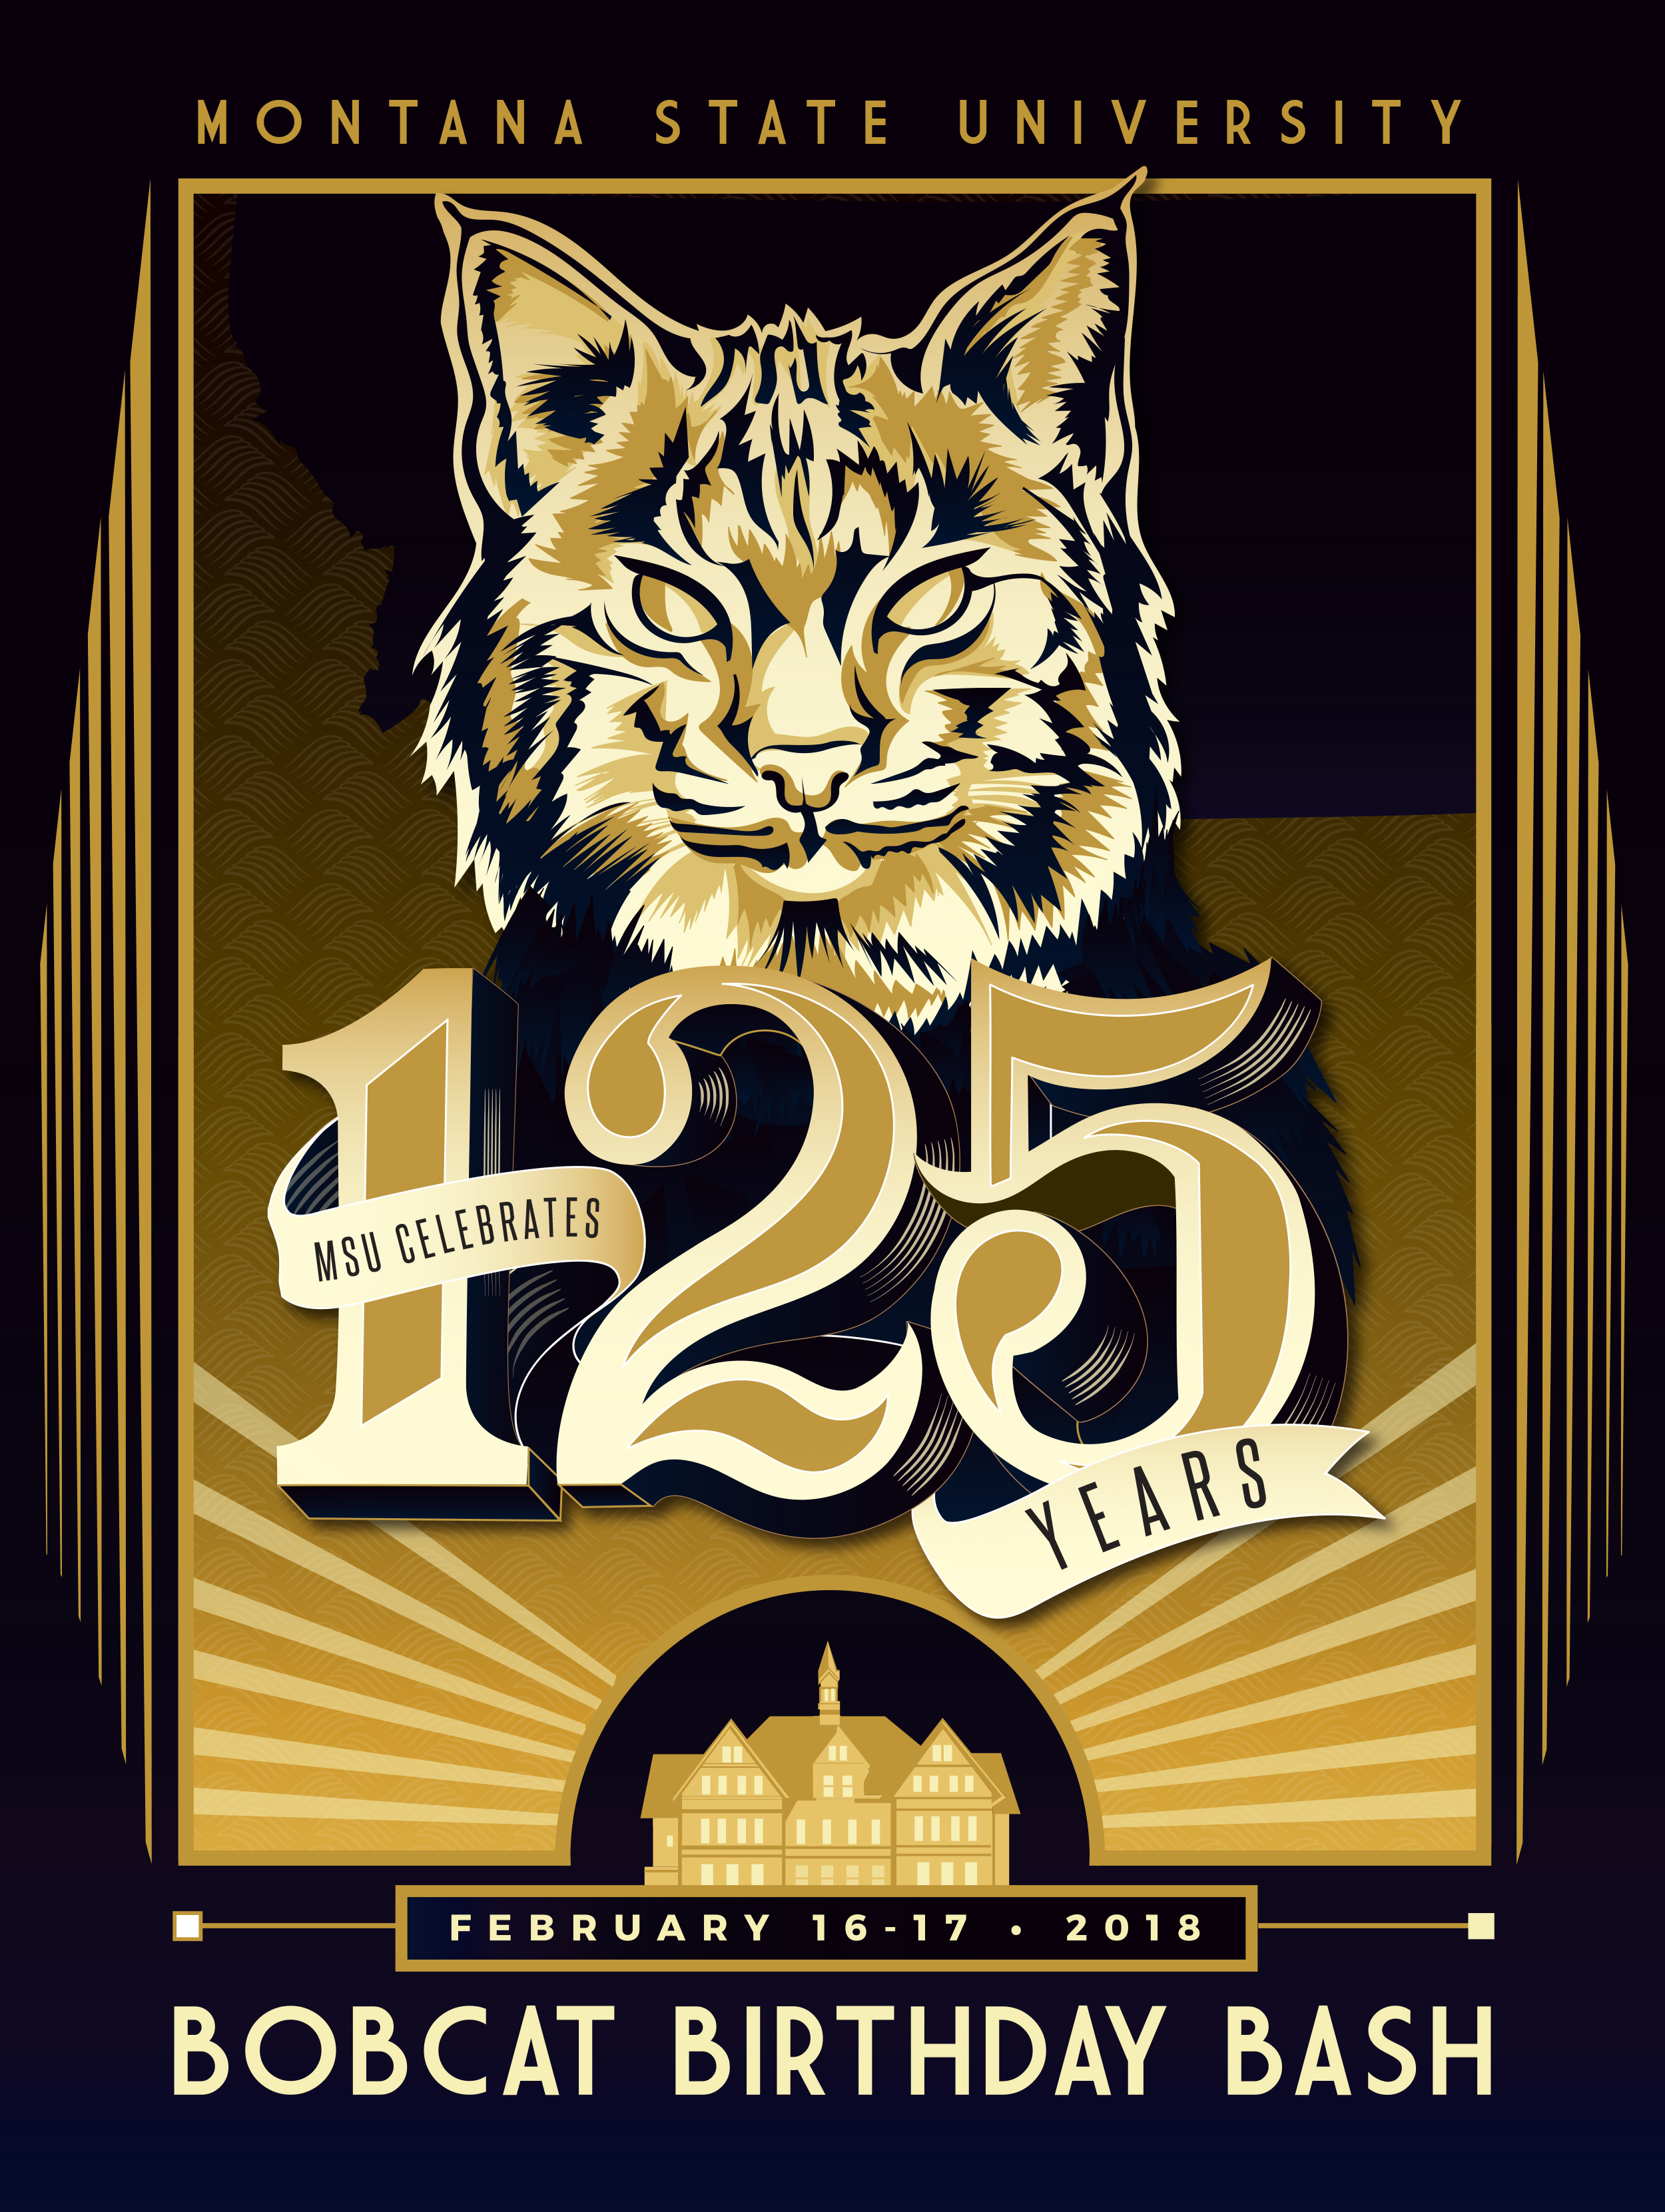 125th anniversary poster, Montana State University